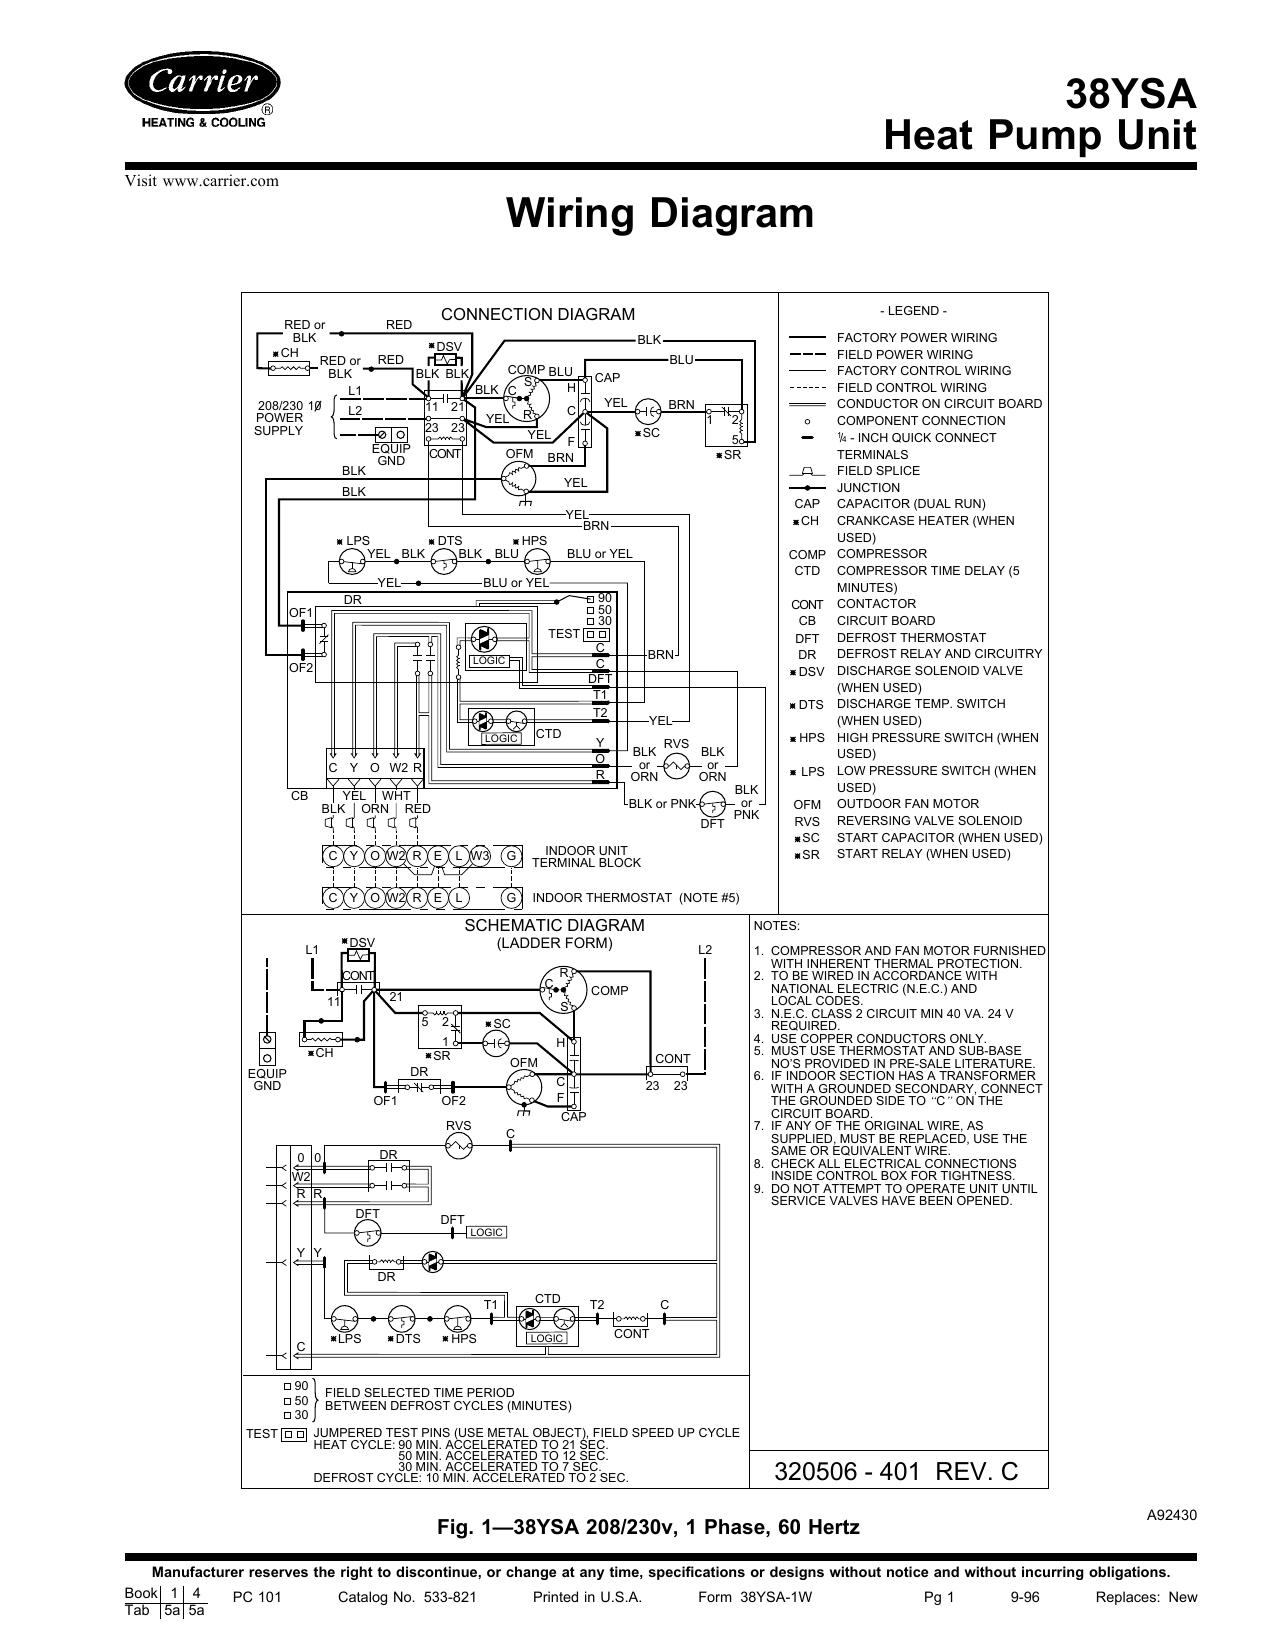 38ysa Heat Pump Unit Wiring Diagram